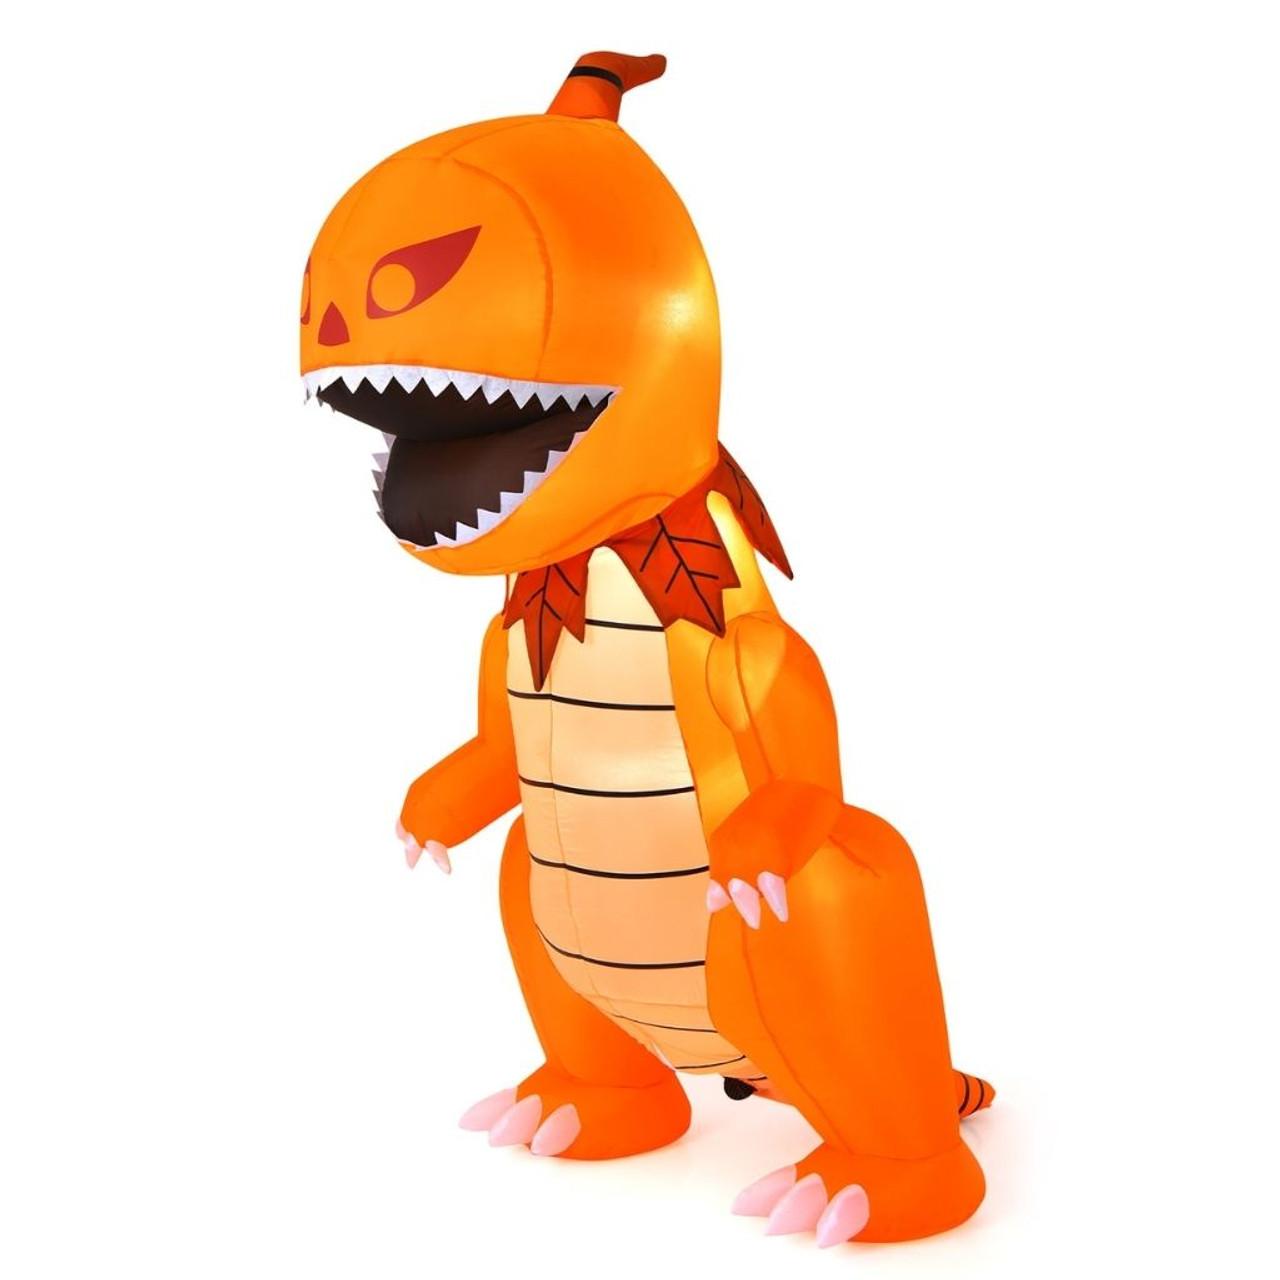 8-Foot Inflatable Halloween LED-Lit Pumpkin Head Dinosaur! .99 (REG 9.99) + Free Shipping at Until Gone!